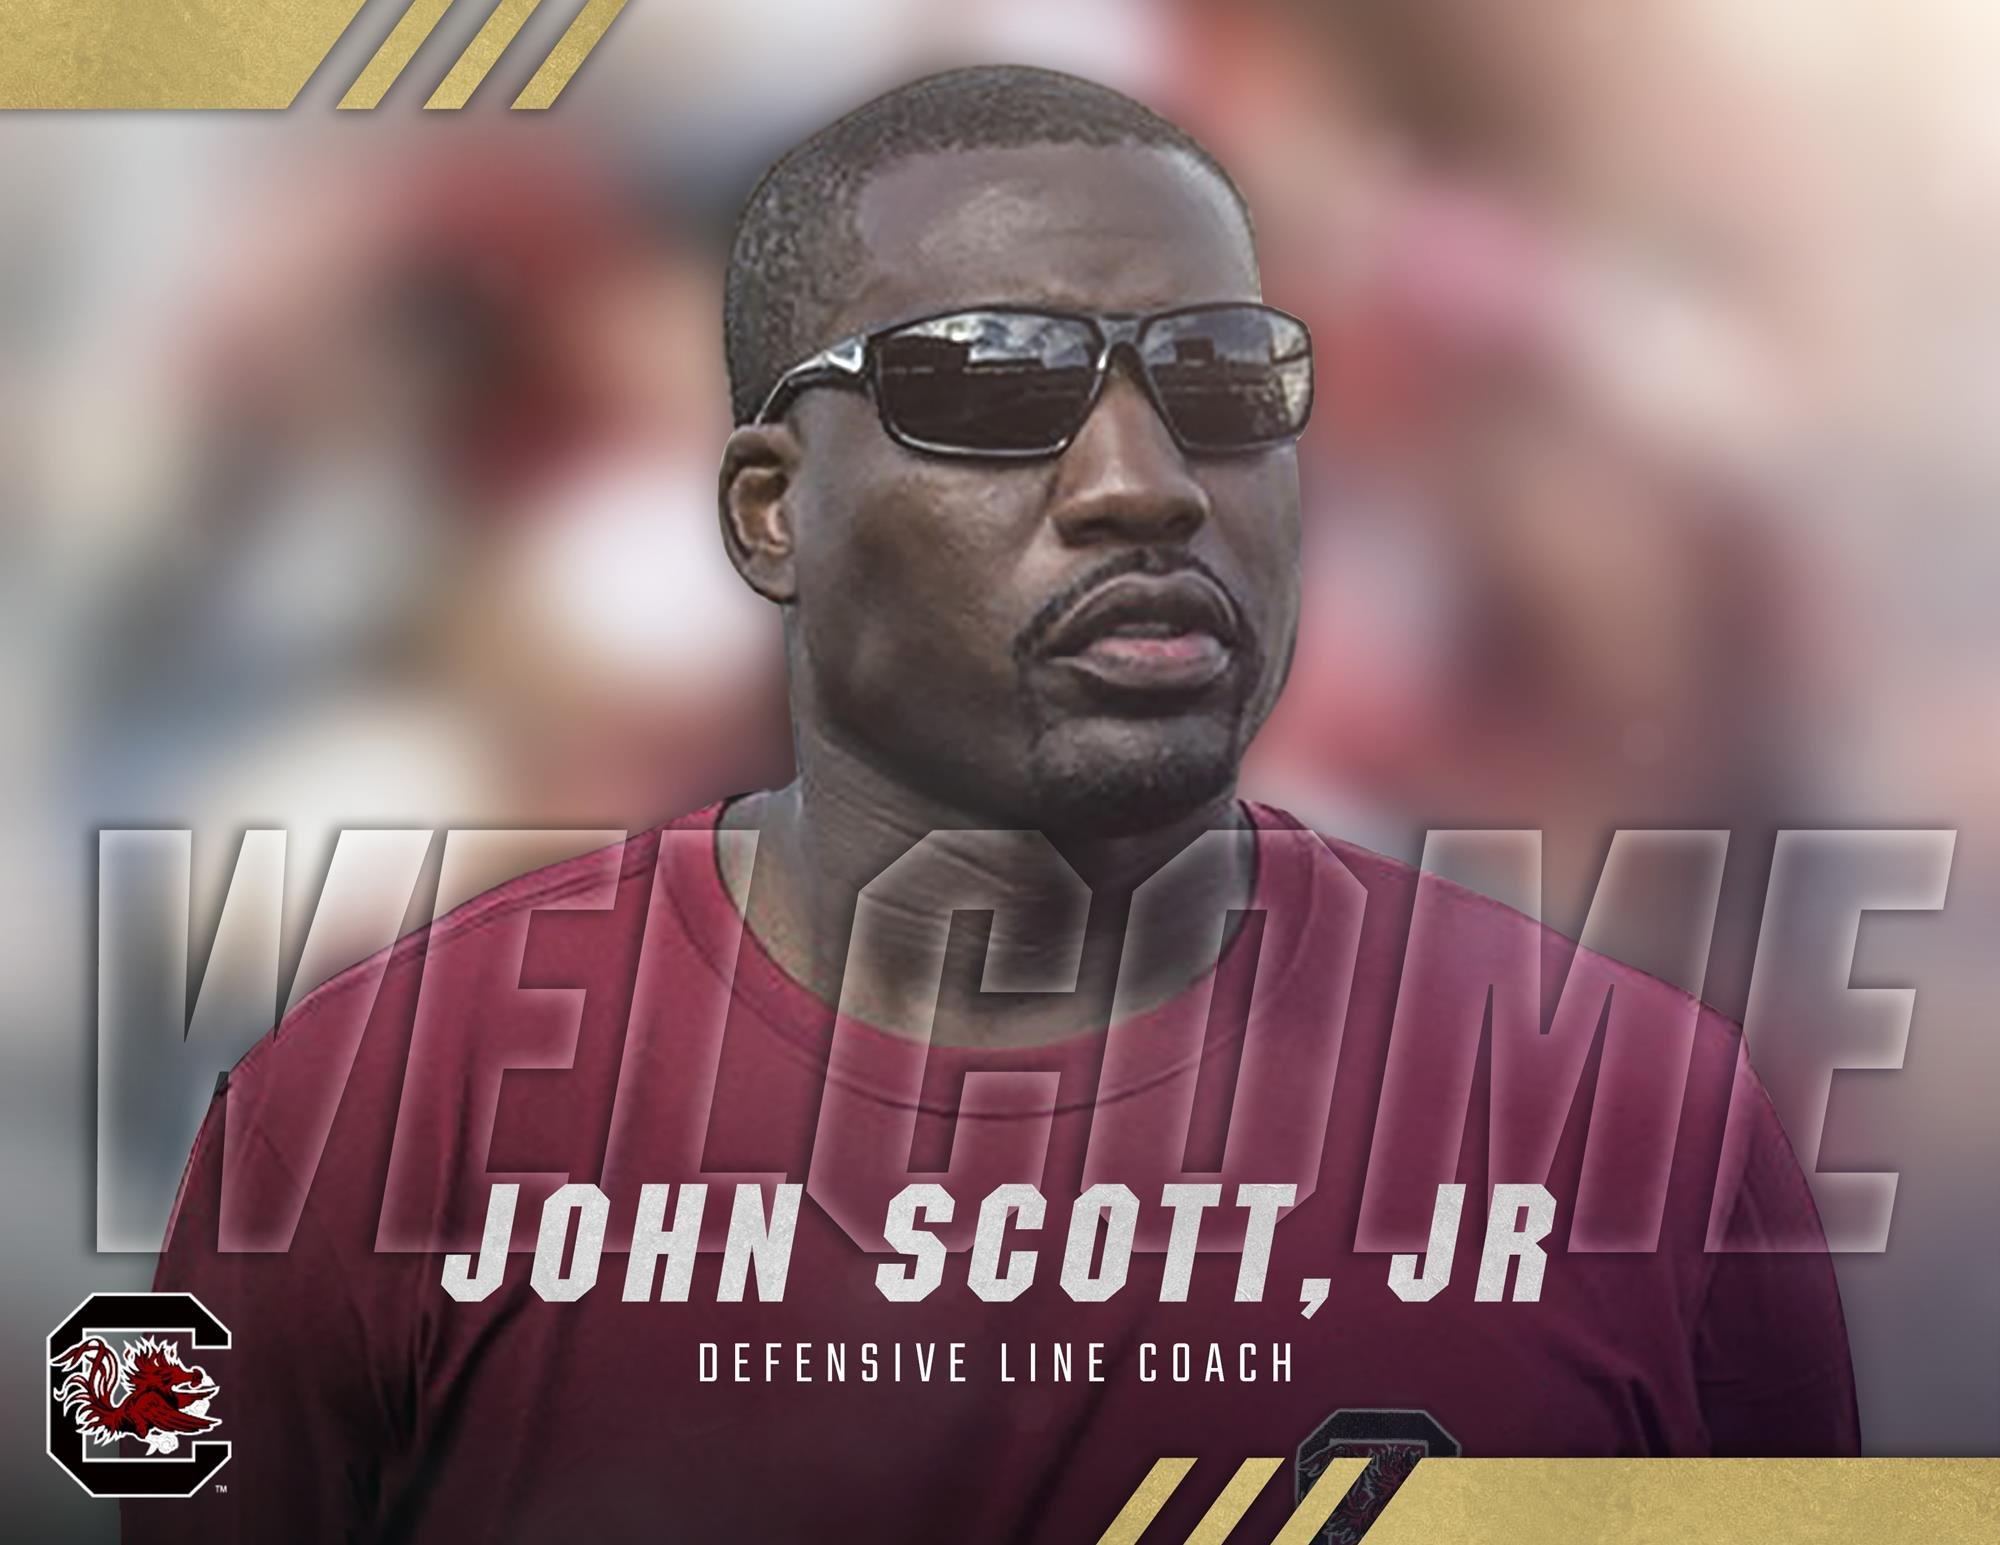 John Scott Jr. Named Defensive Line Coach - January 23, 2019 | GCF Staff Report